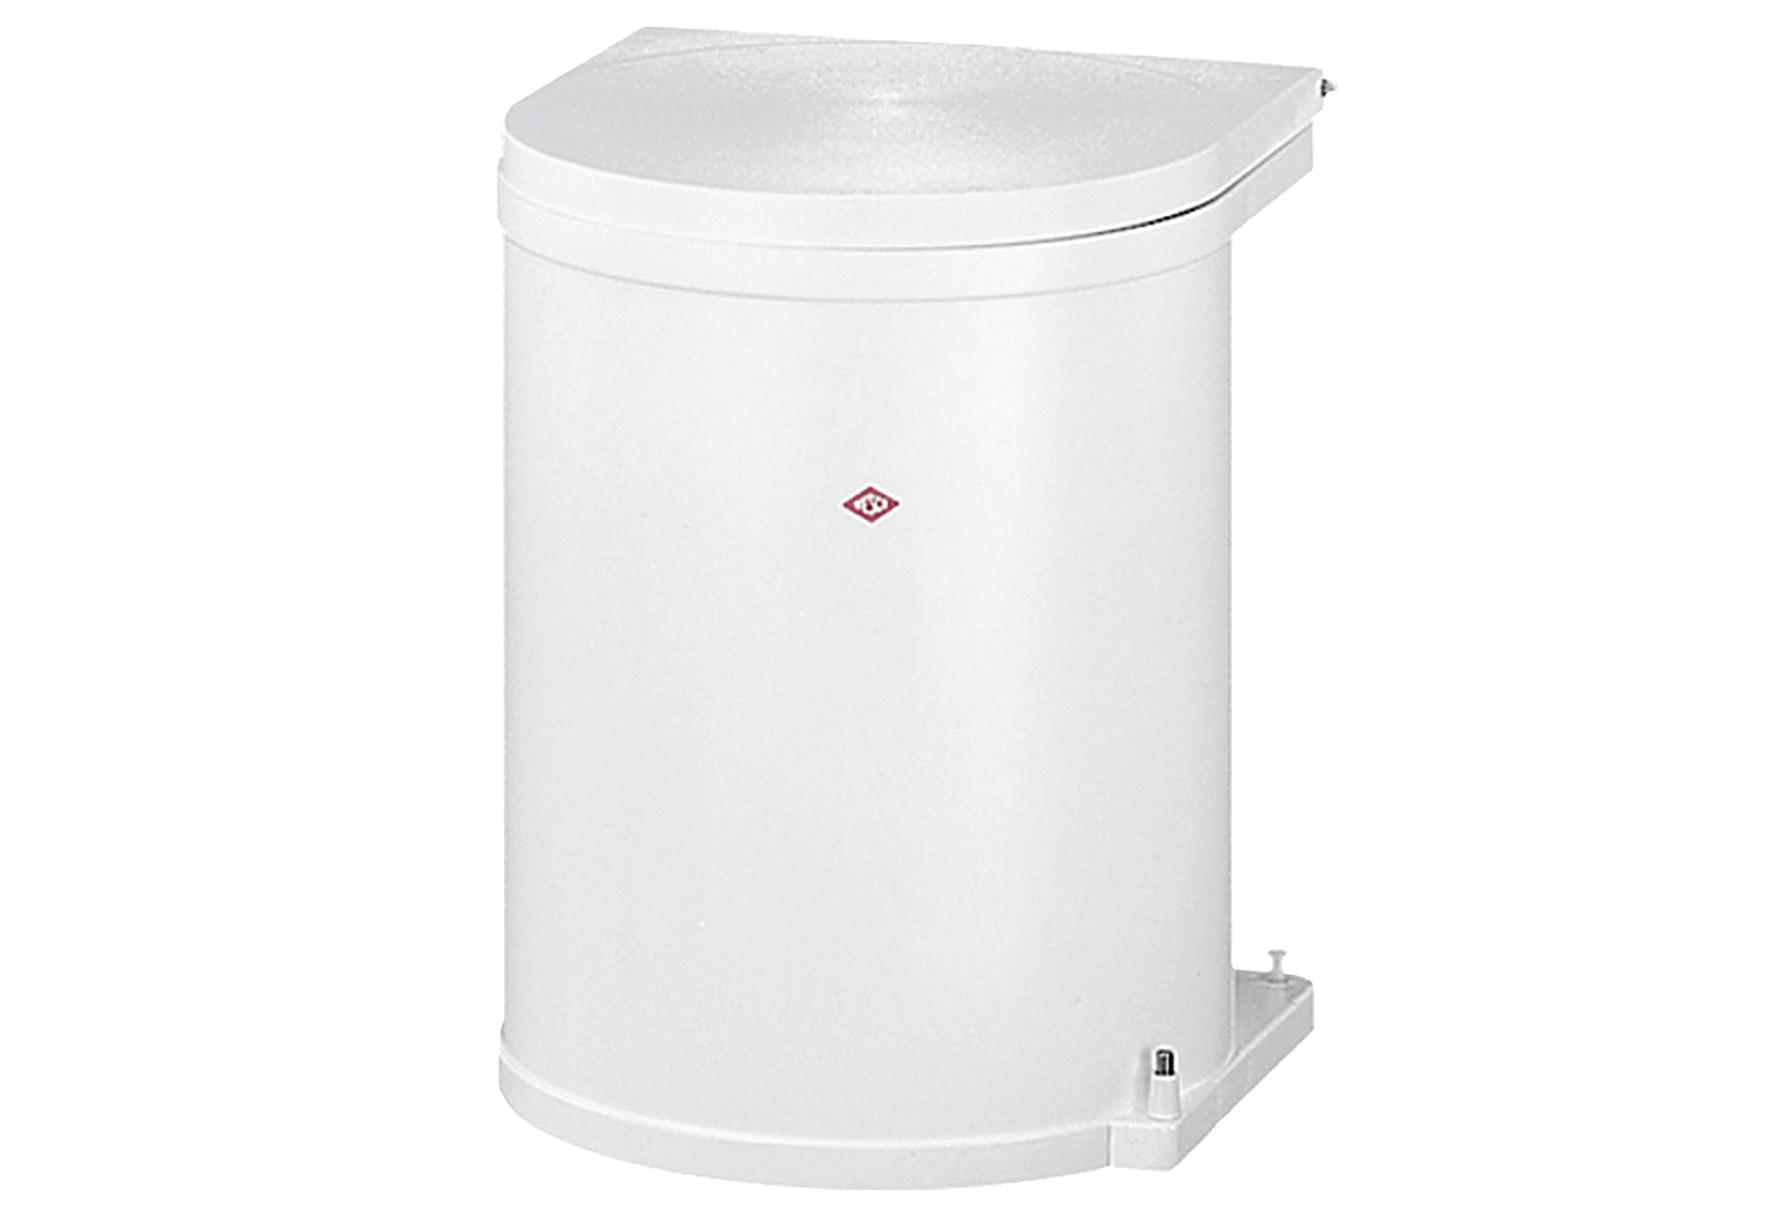 WESCO Einbau-Abfalleimer 11 l 30cm weiß